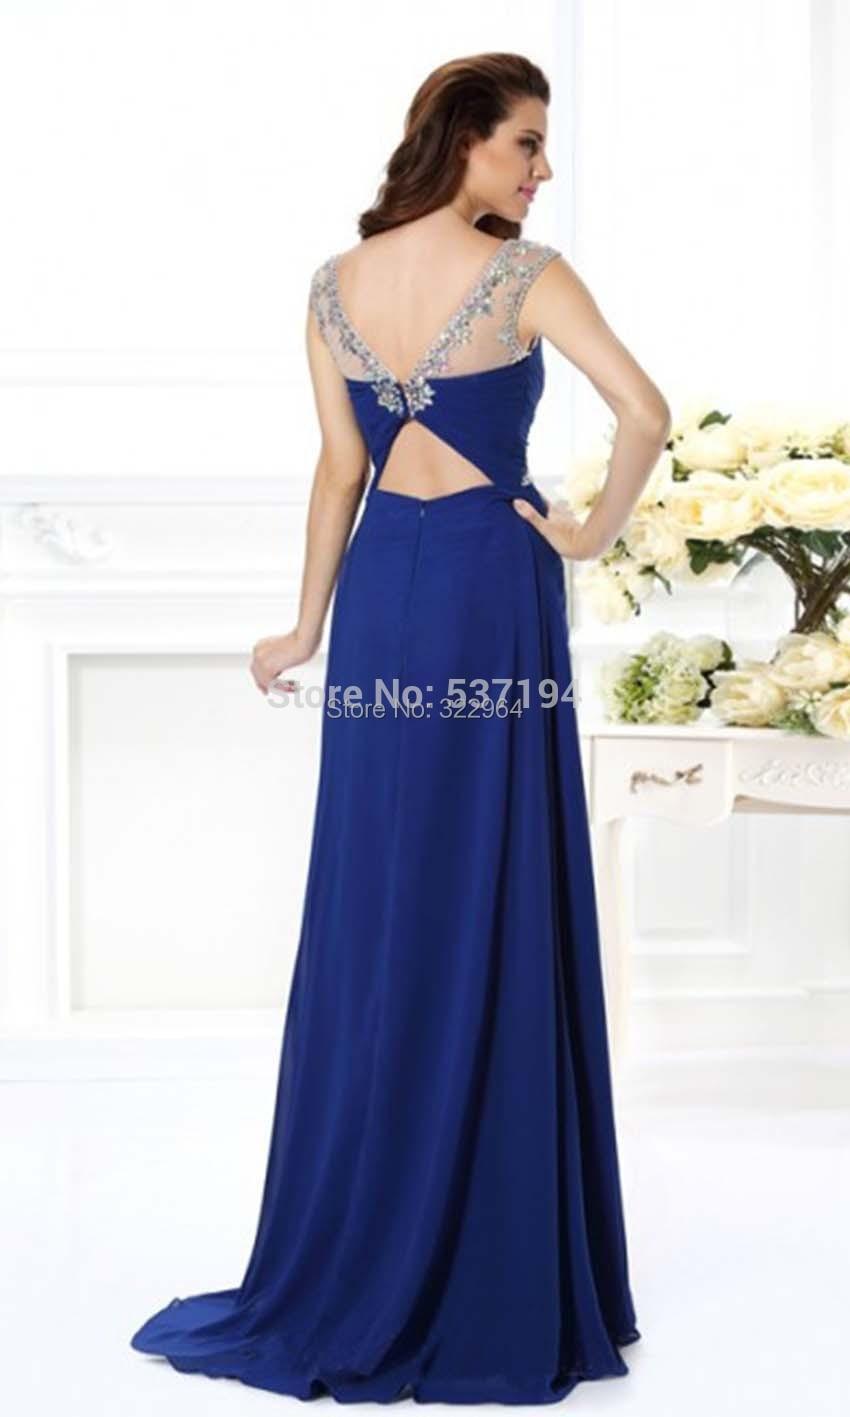 Fashion Royal Blue Chiffon Abendkleider Lang 11 Long Beaded